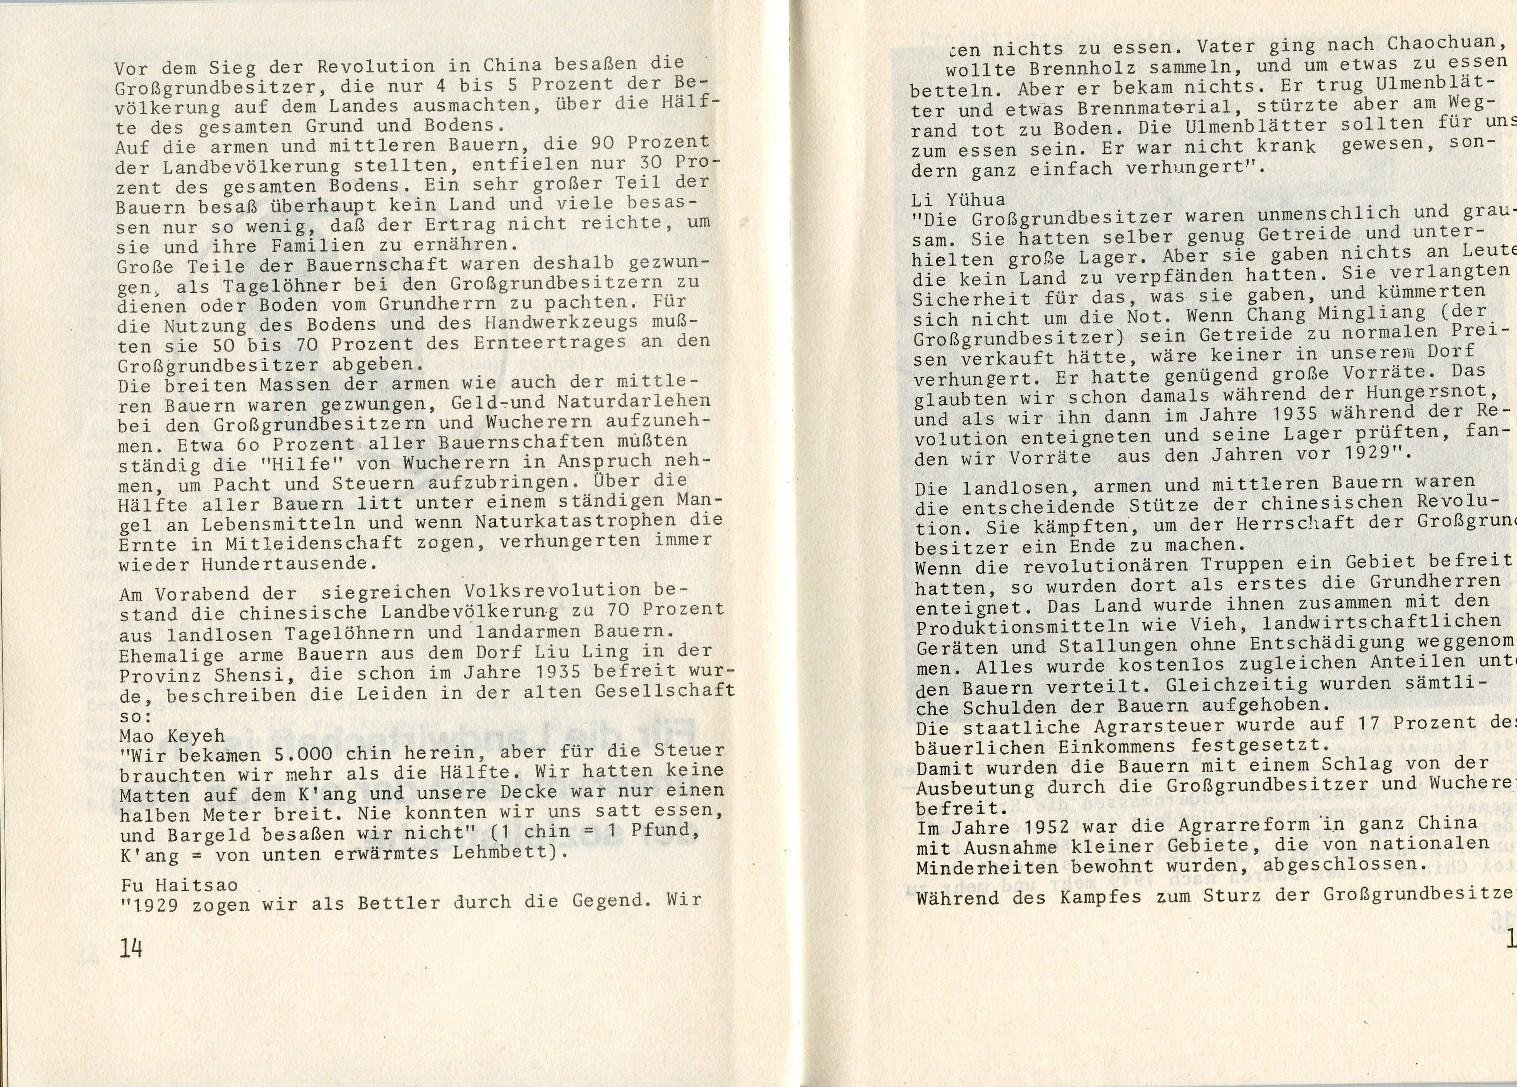 ZB_KPChinas_1971_09